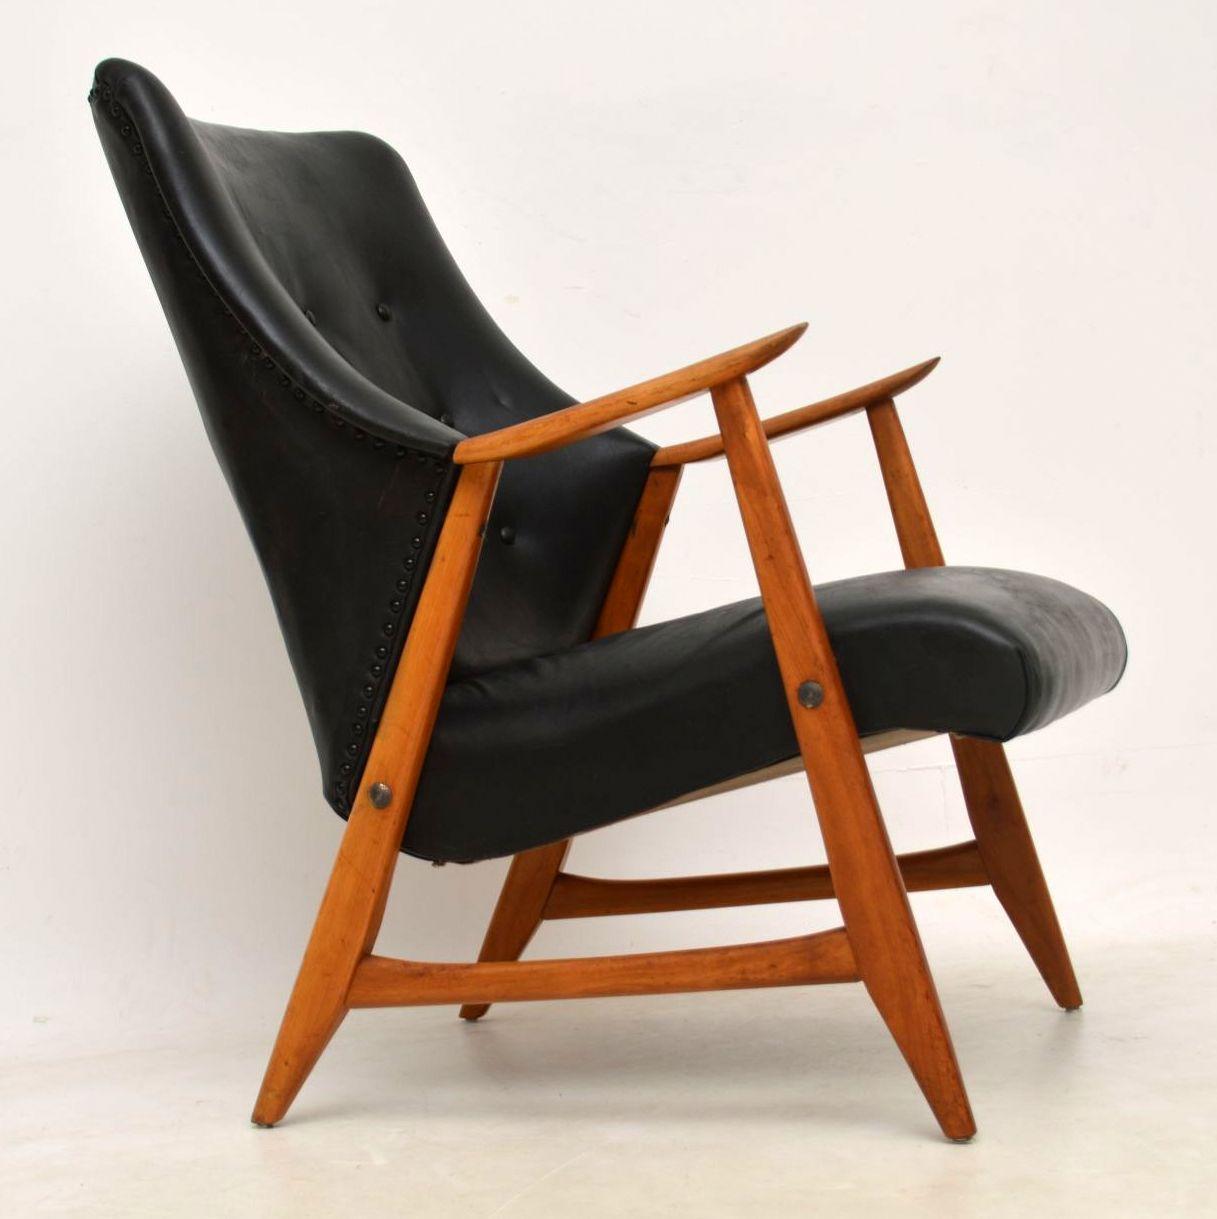 Vintage Furniture For Sale Online: 1960's Danish Vintage Leather & Teak Armchair